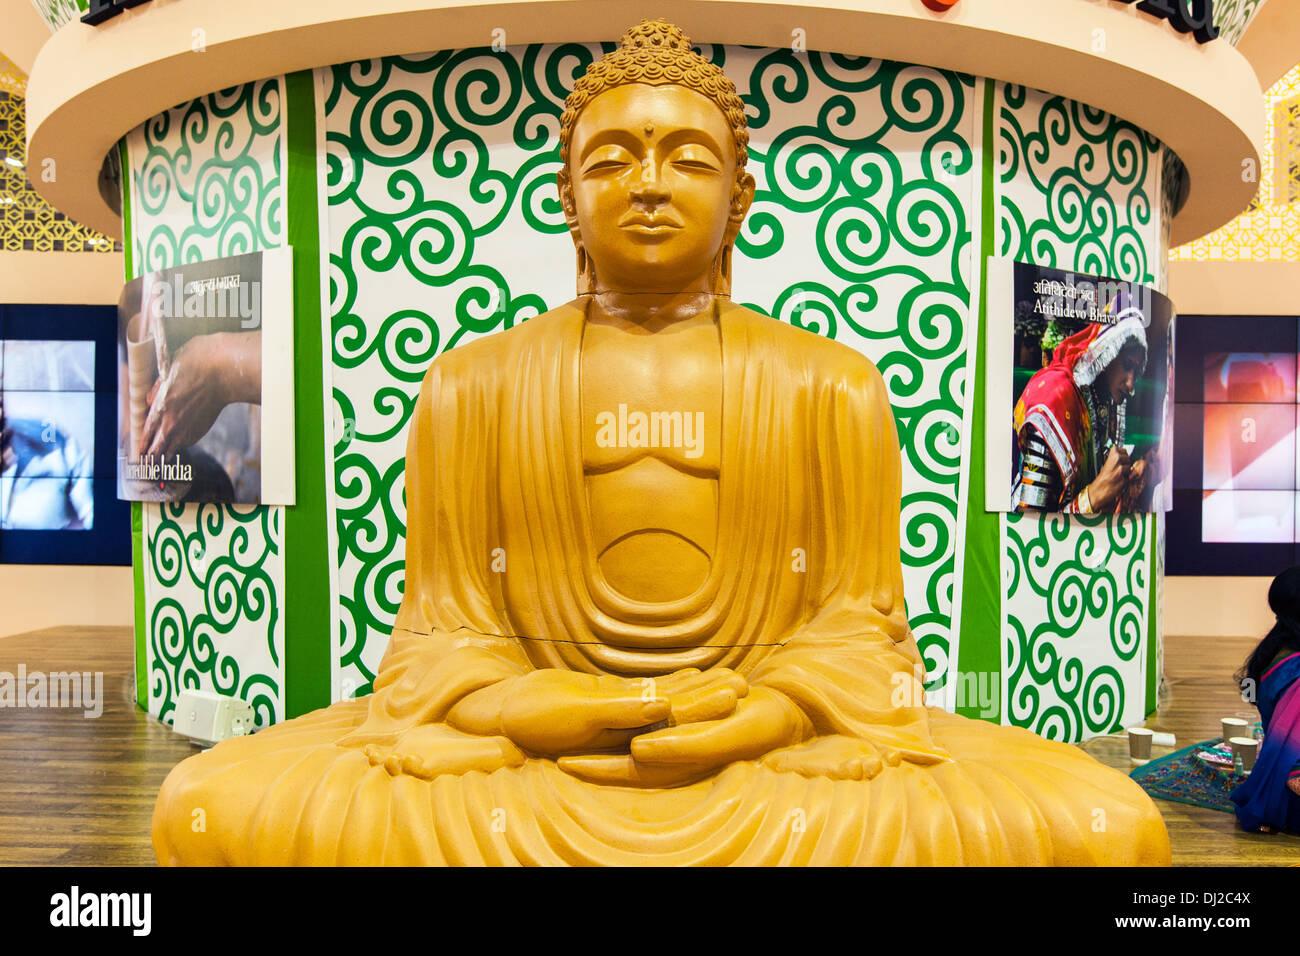 A Golden Buddha India - Stock Image